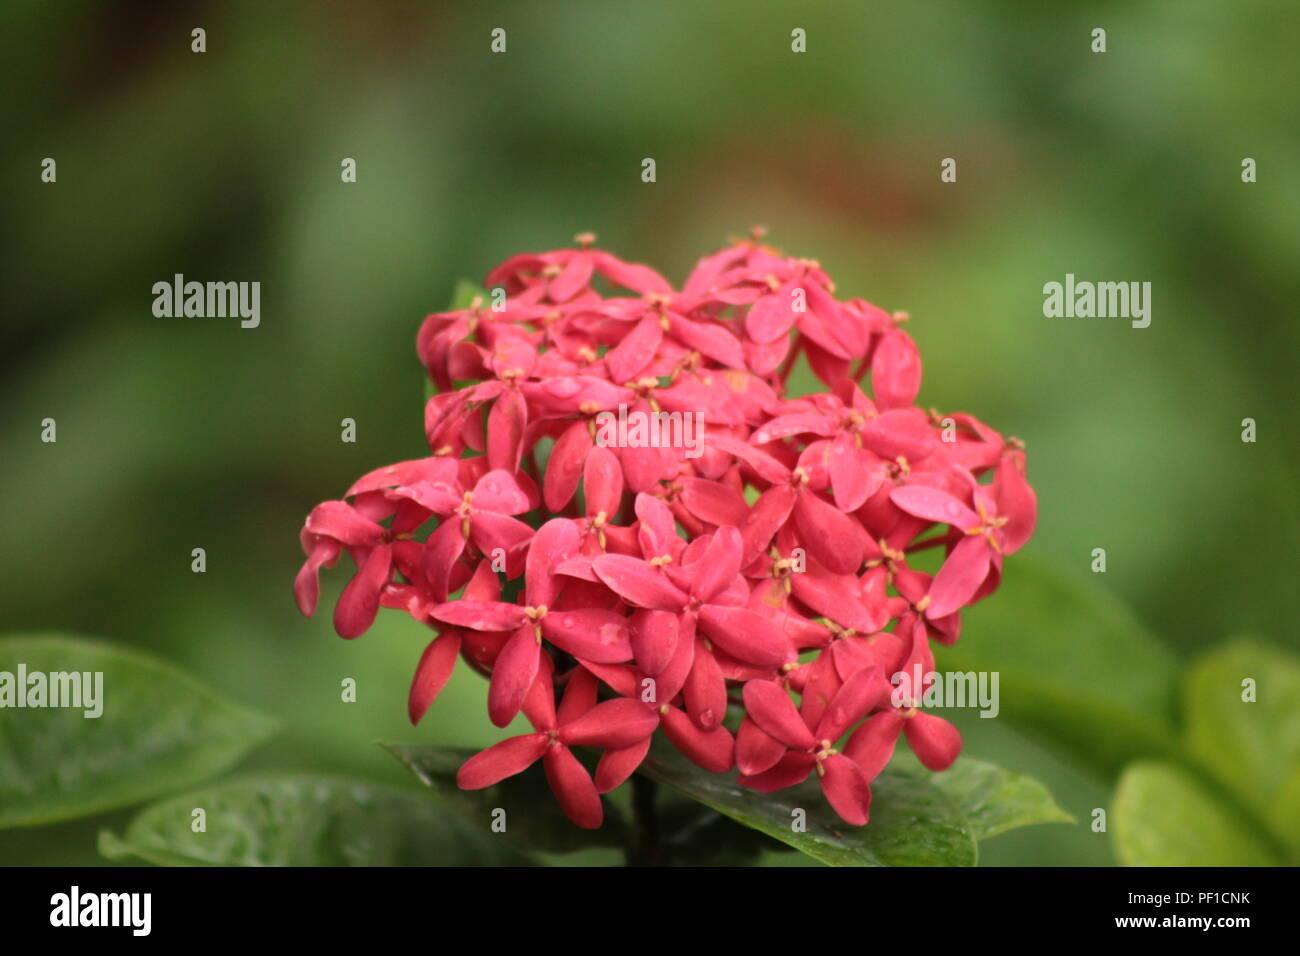 Spring season in india stock photos spring season in india stock beautiful park in spring season in india stock image mightylinksfo